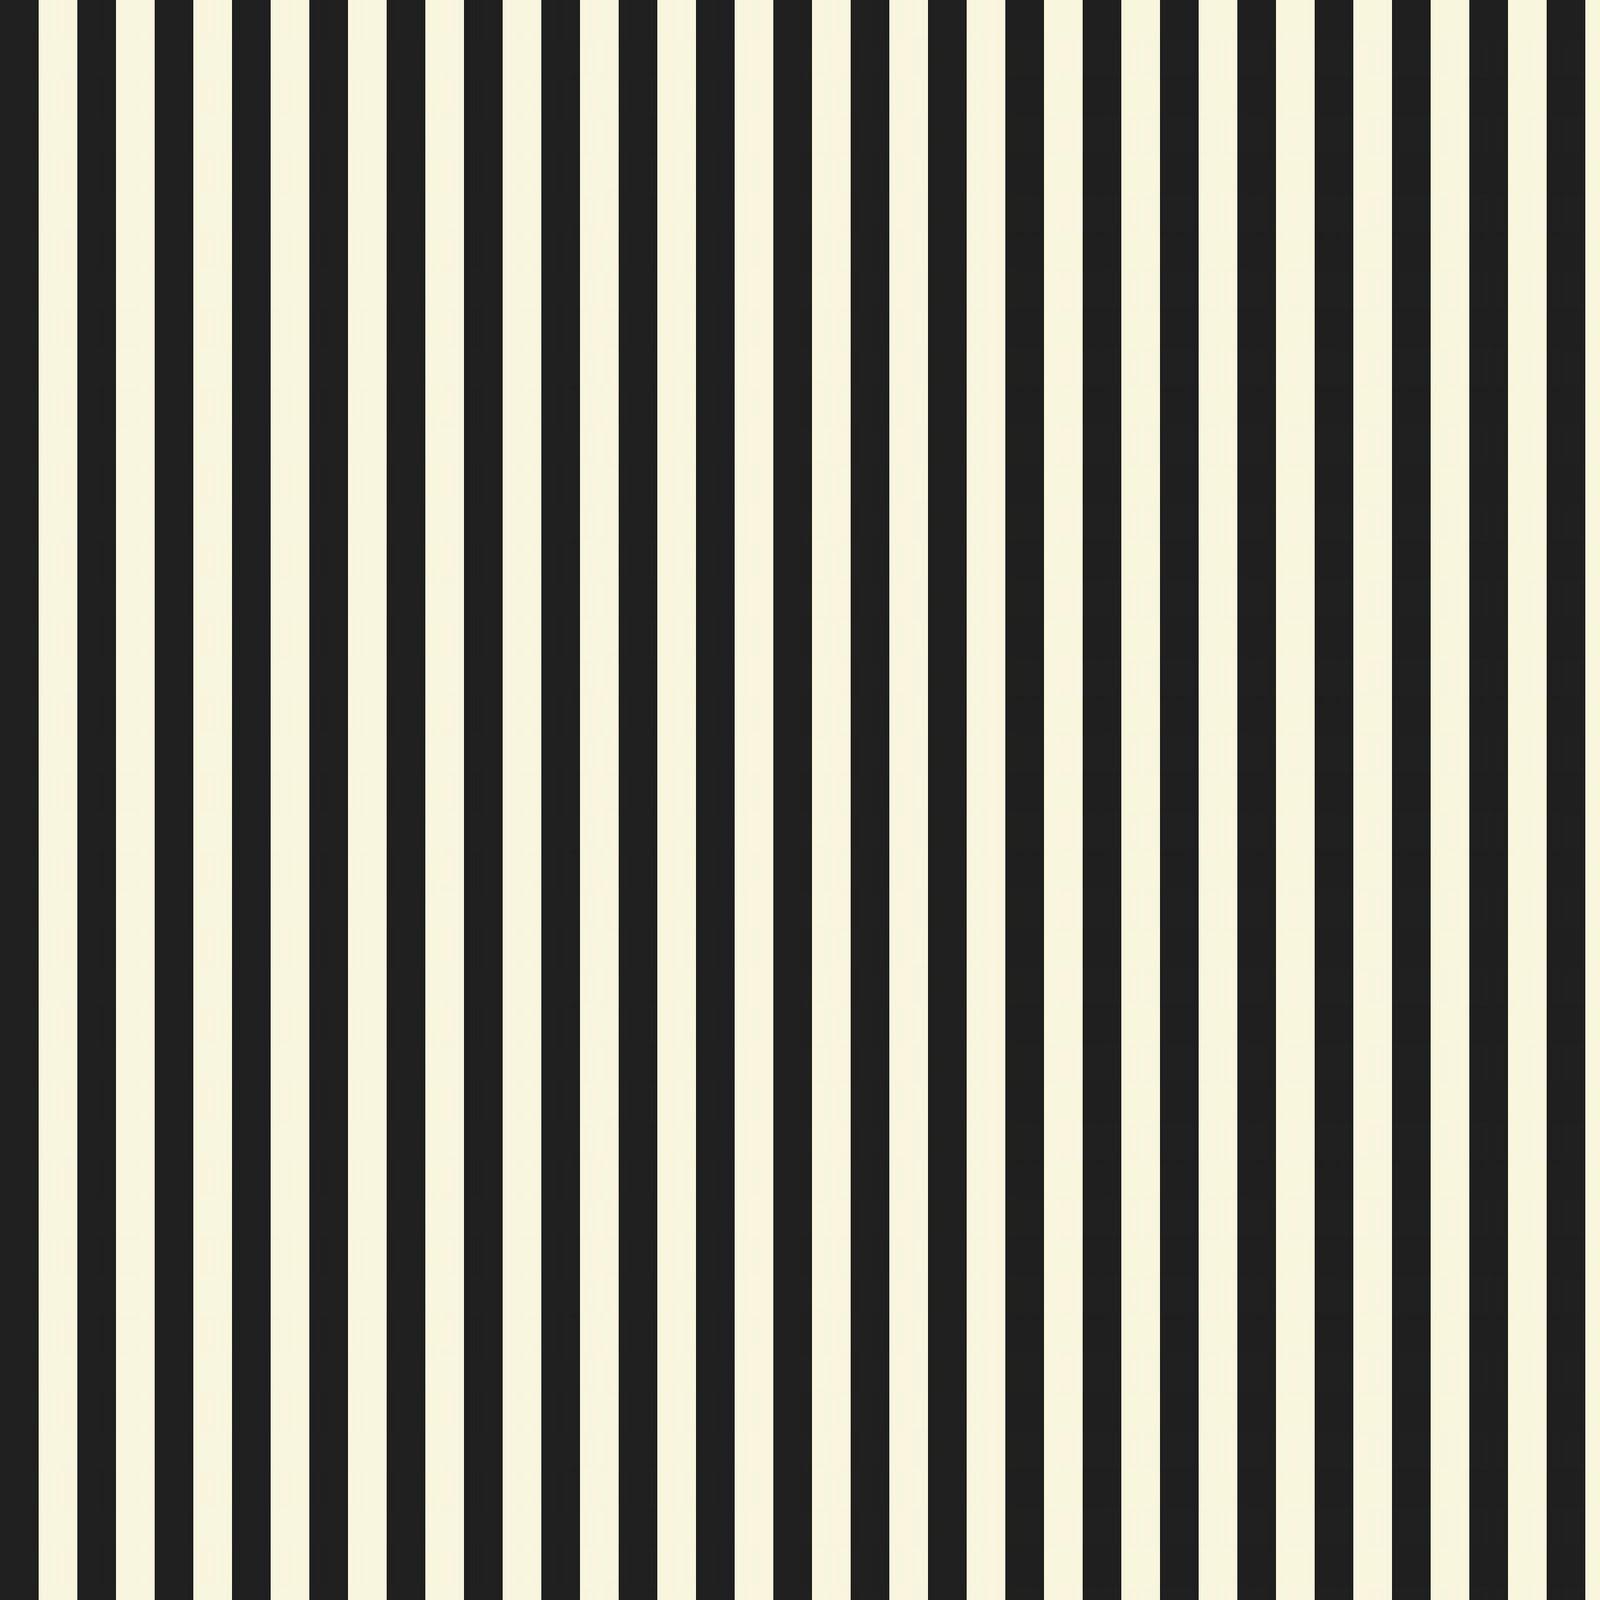 paper stripes scrapbook digital cream gold pink stripe january striped stamps save march